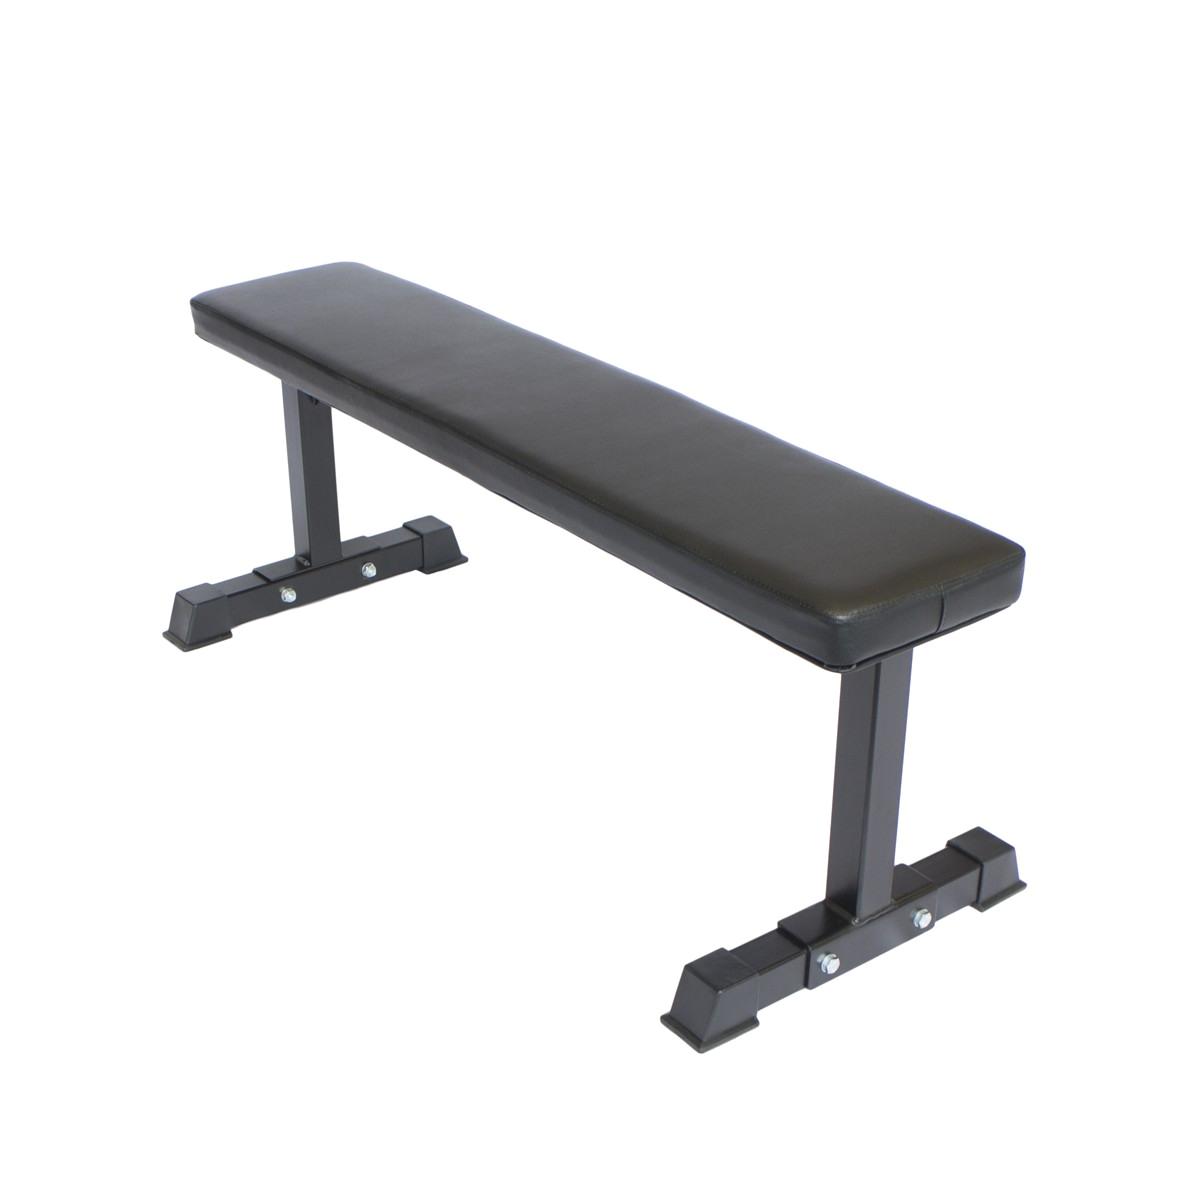 xb flat utility bench heavy duty multi use weight bench x training